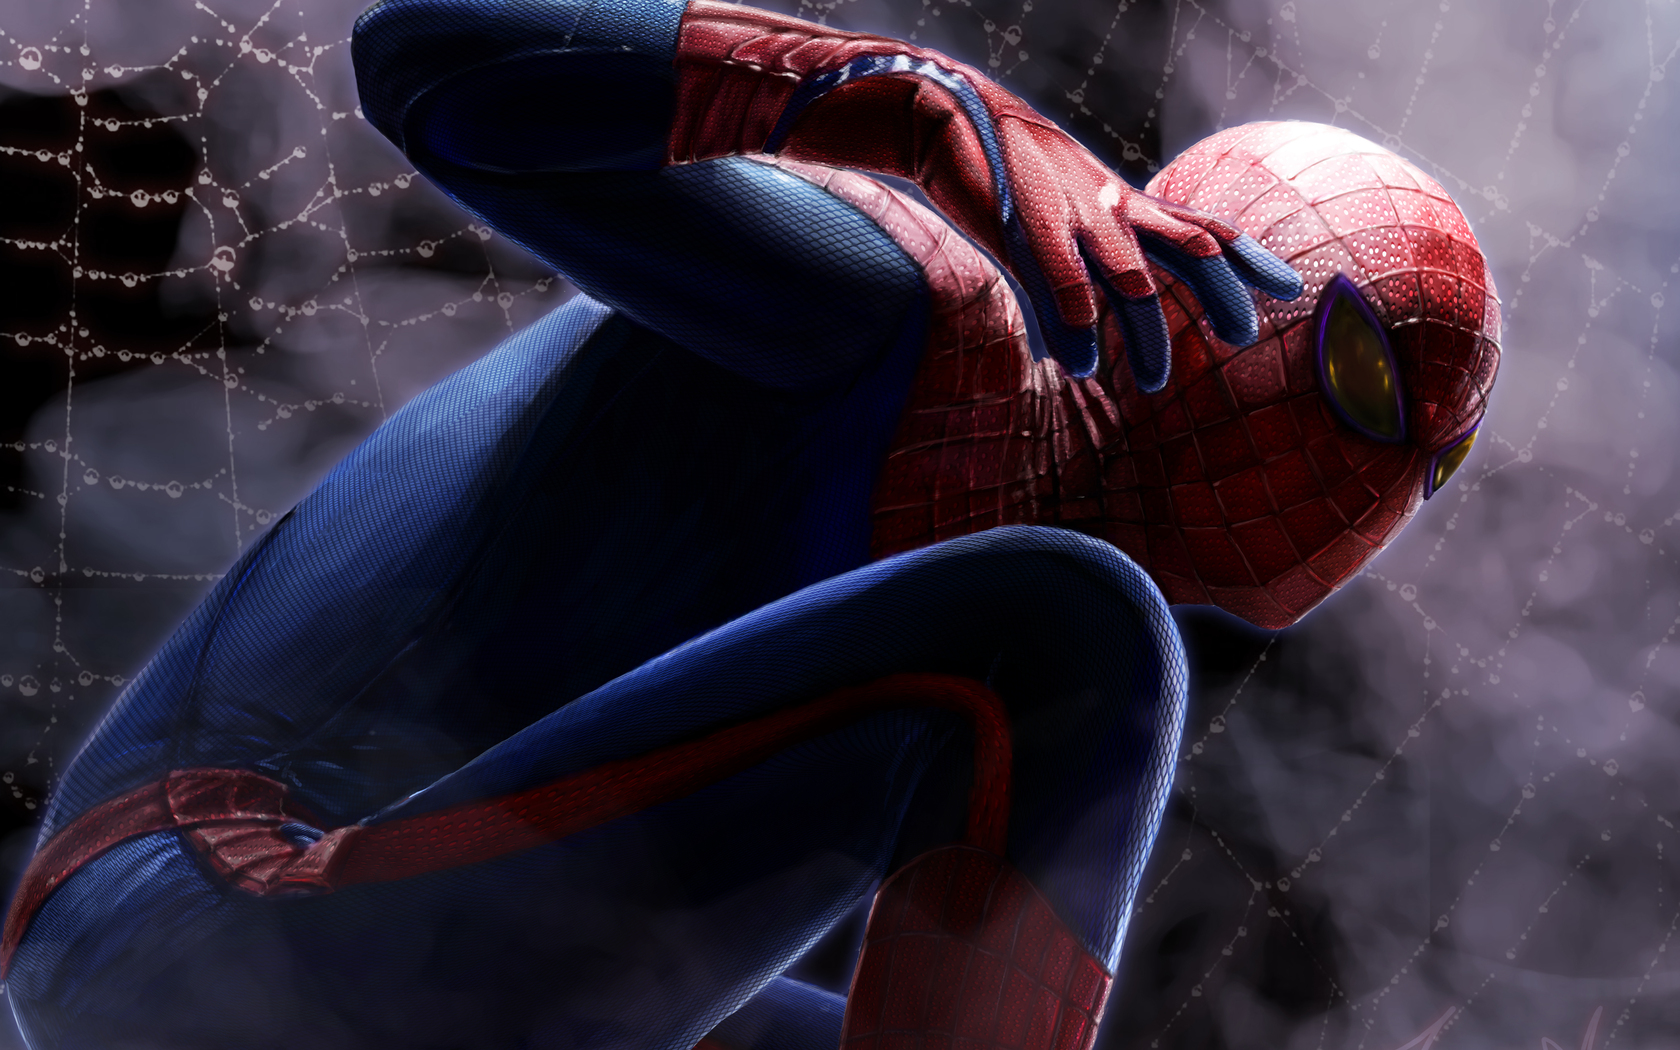 Art Spider Man Wallpaper superhero Spider Man HD Wallpapers 1680x1050